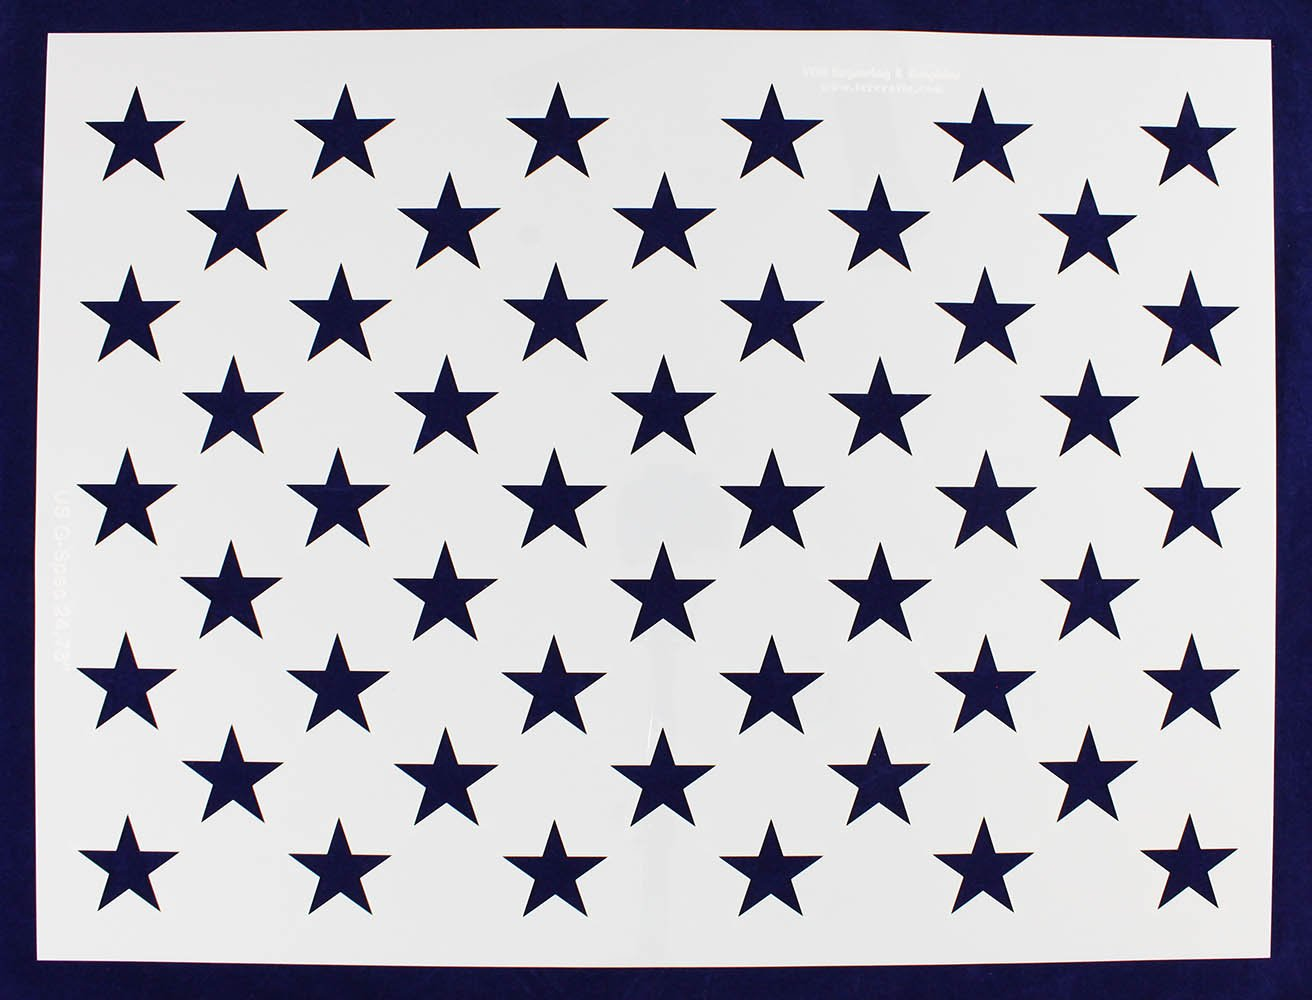 50 Star Field Stencil - US/American Flag - G-Spec 18 Inch H x 24.73 Inch L by TCR Crafts